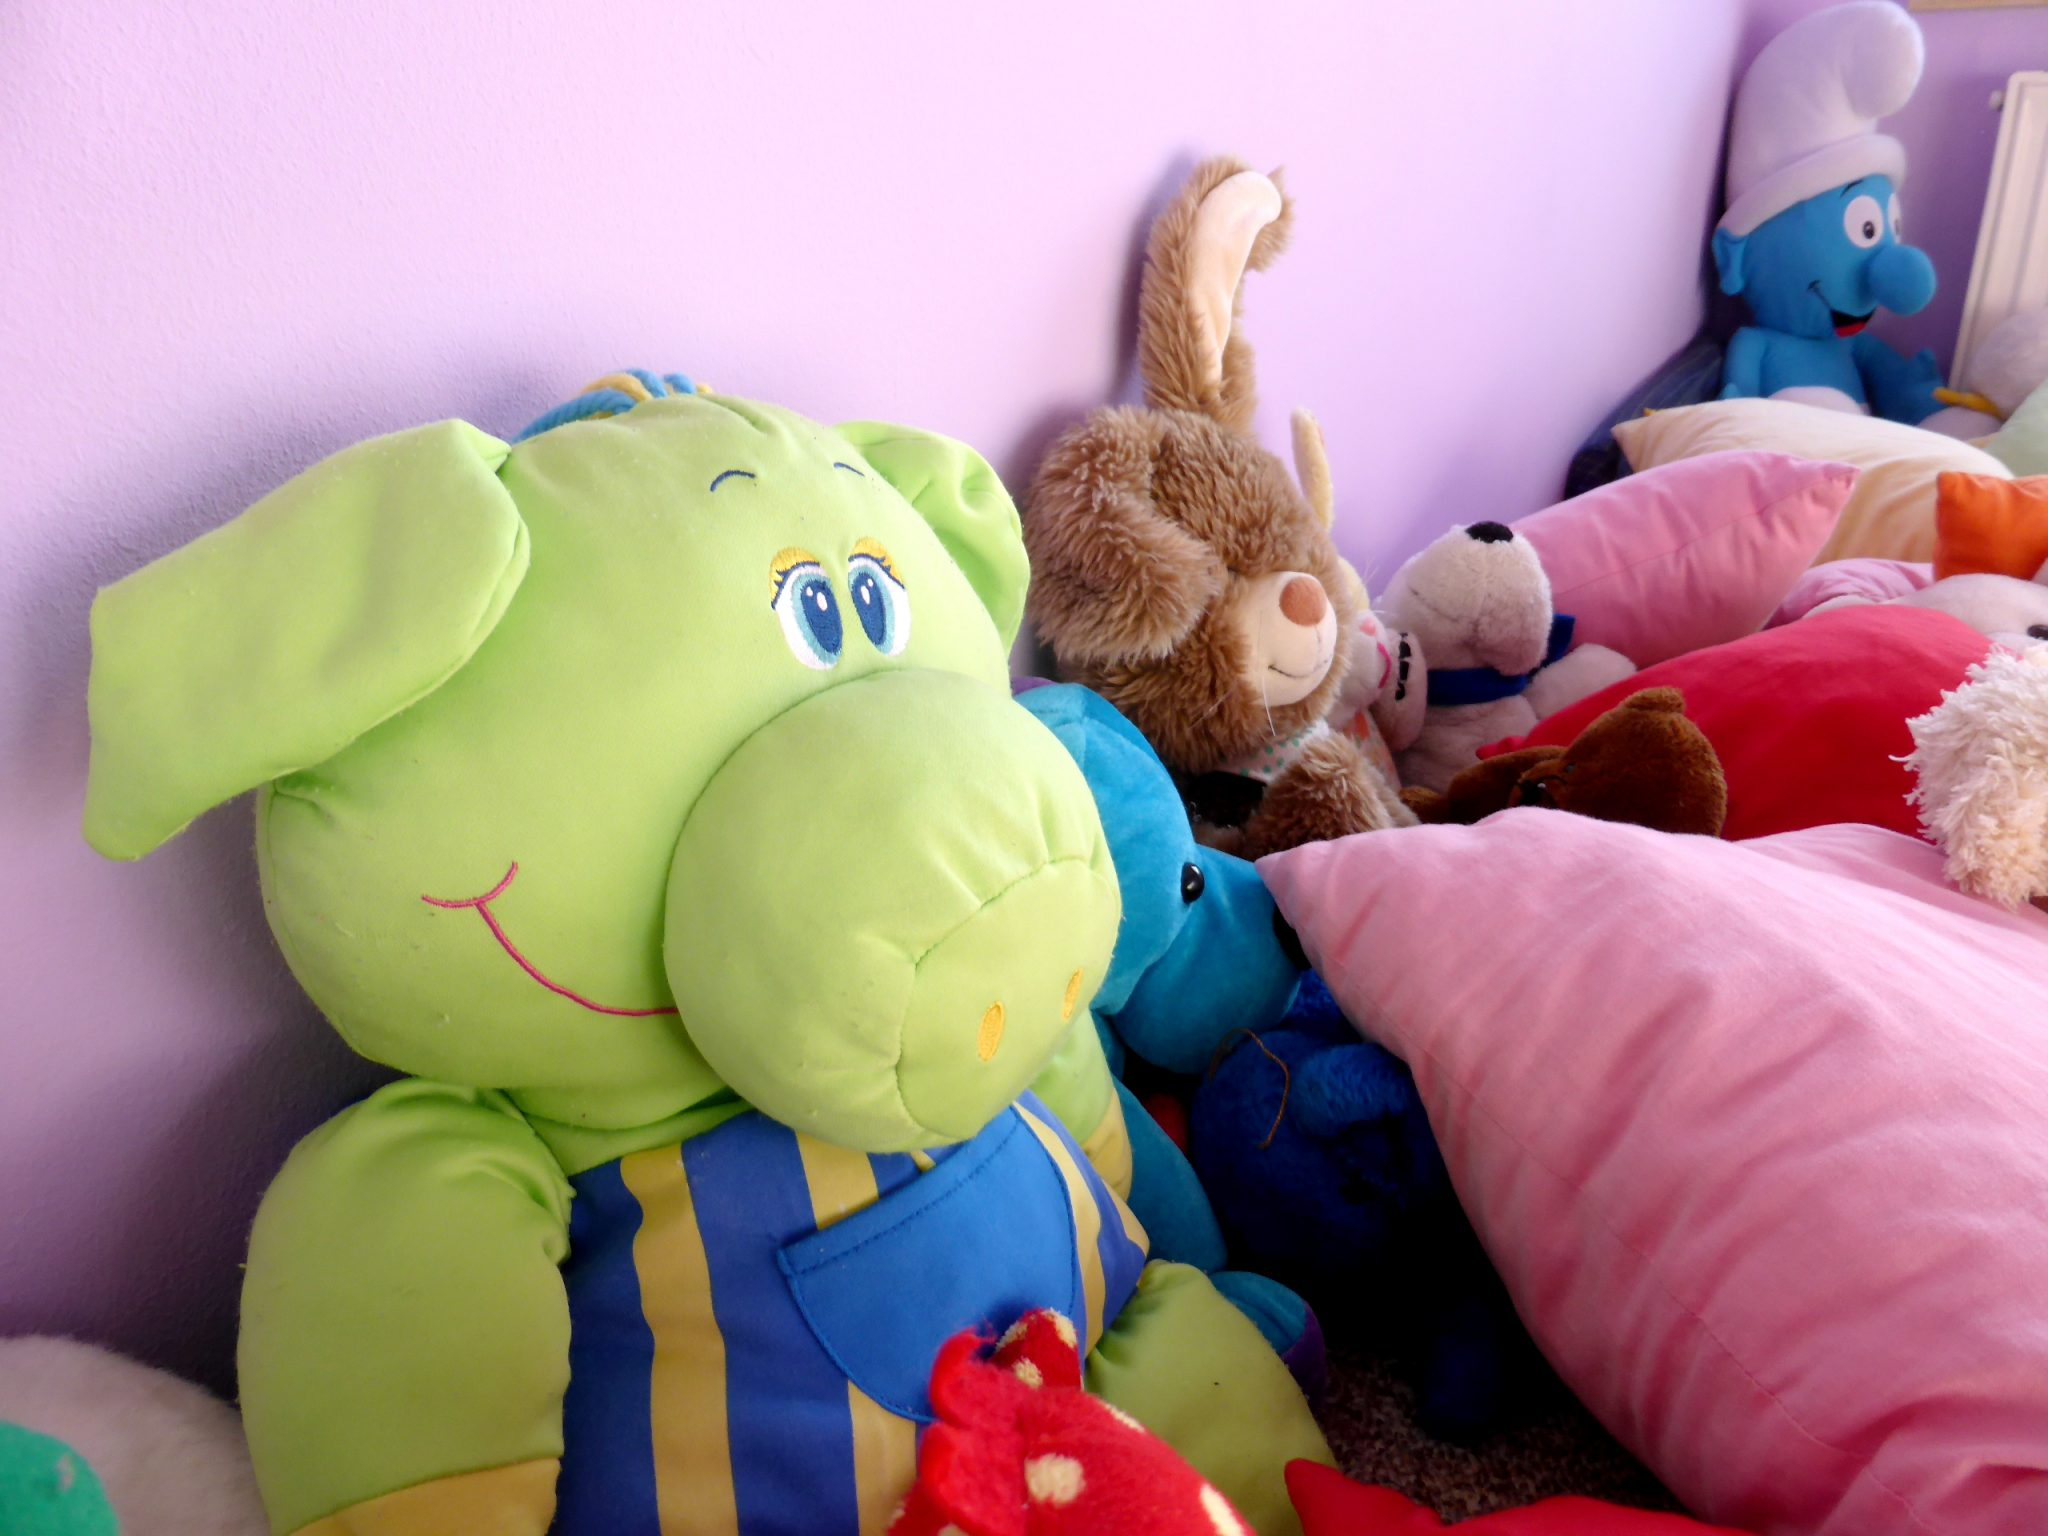 Snozzle 6 Kita Kid Zone Kinderbetreuung - Tagesablauf